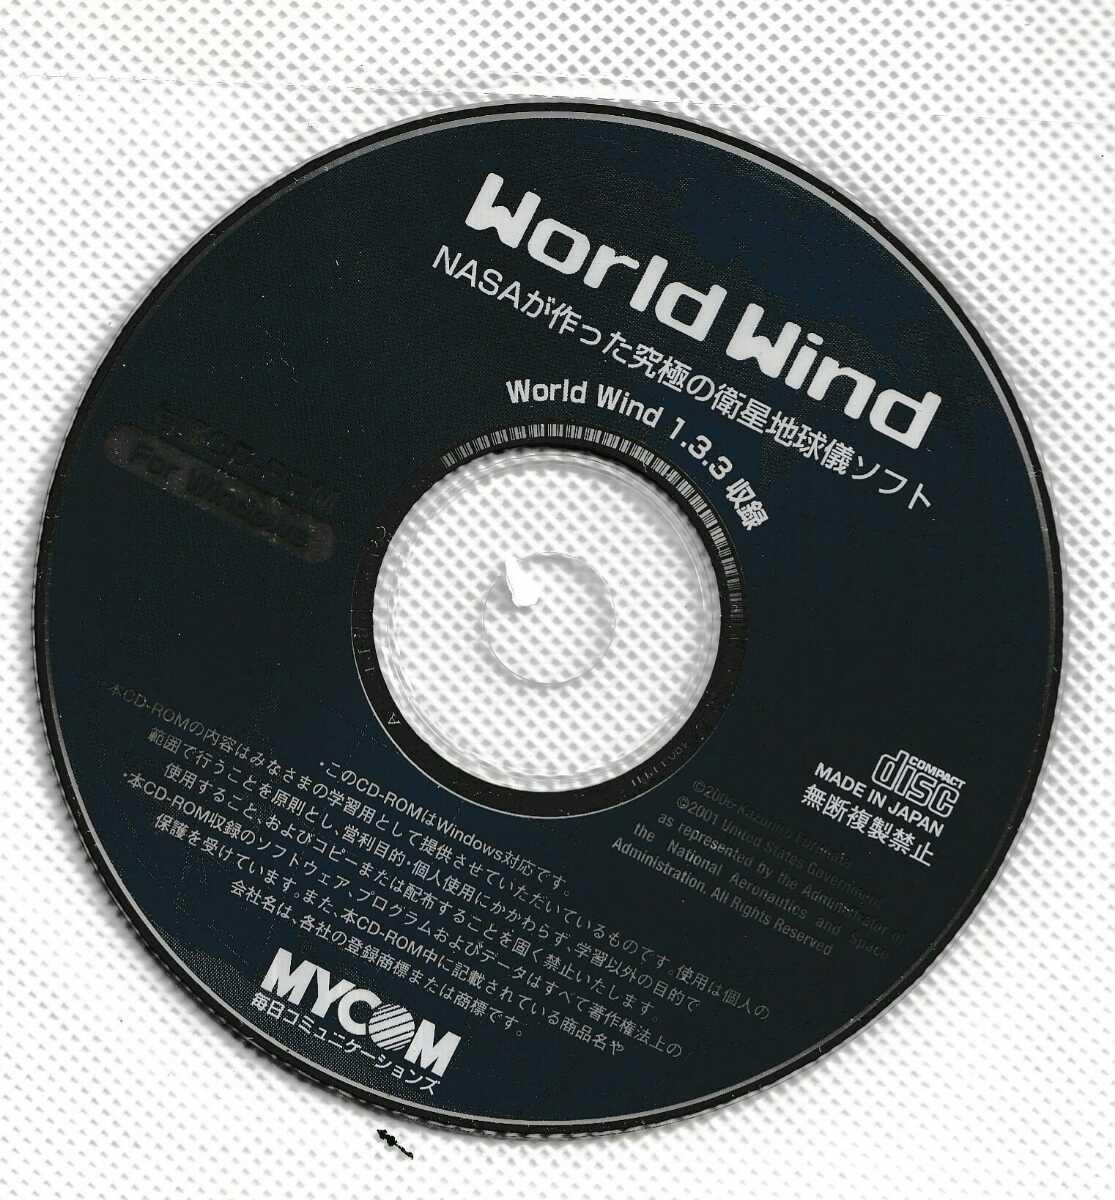 World Wind ▽NASAが作った究極の衛星地球儀ソフト_画像2